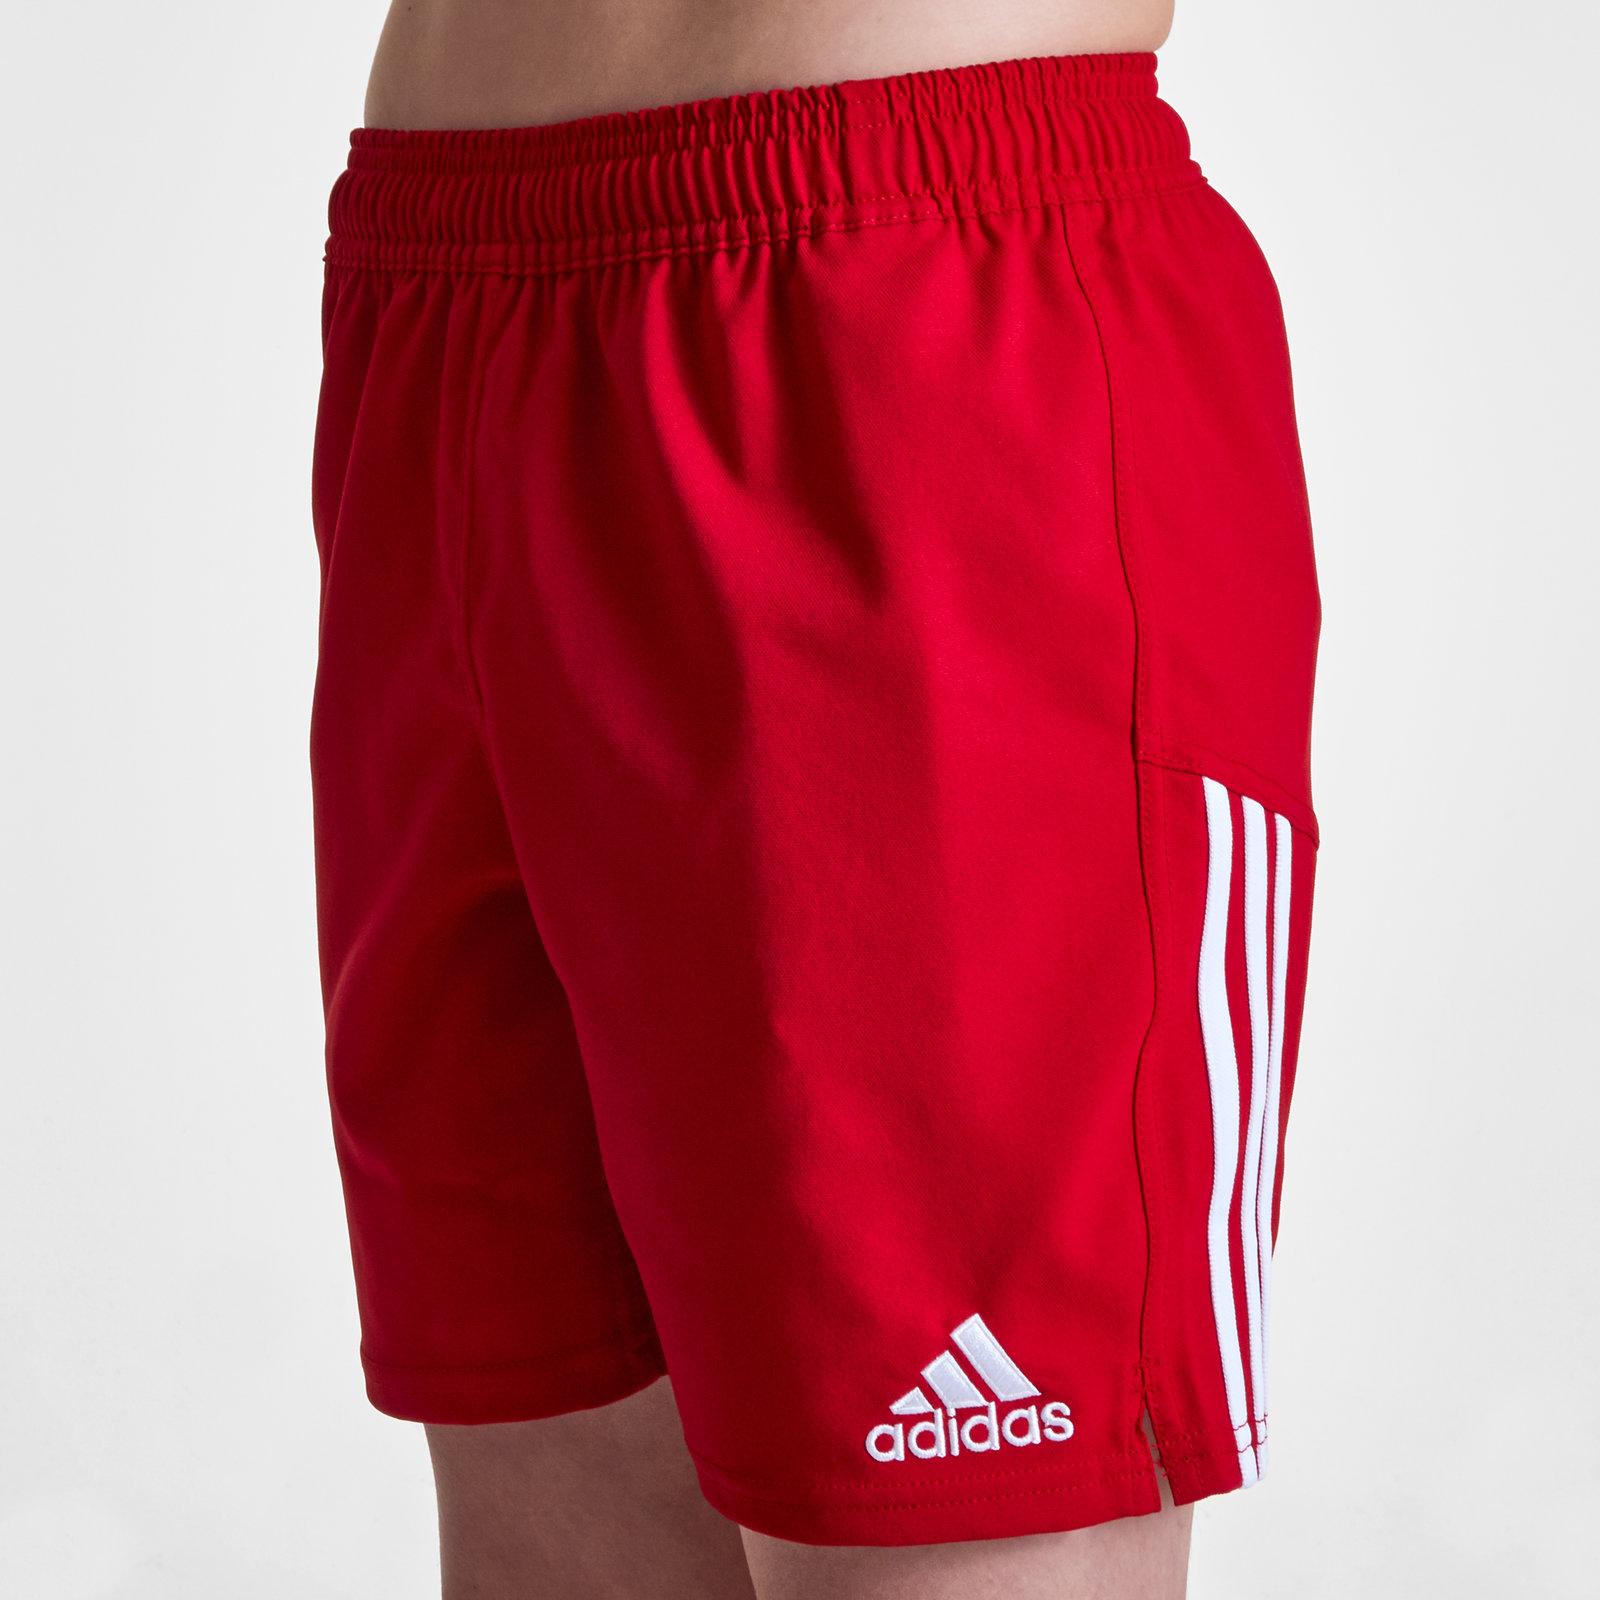 Image of 3 Stripe Kids Training Shorts